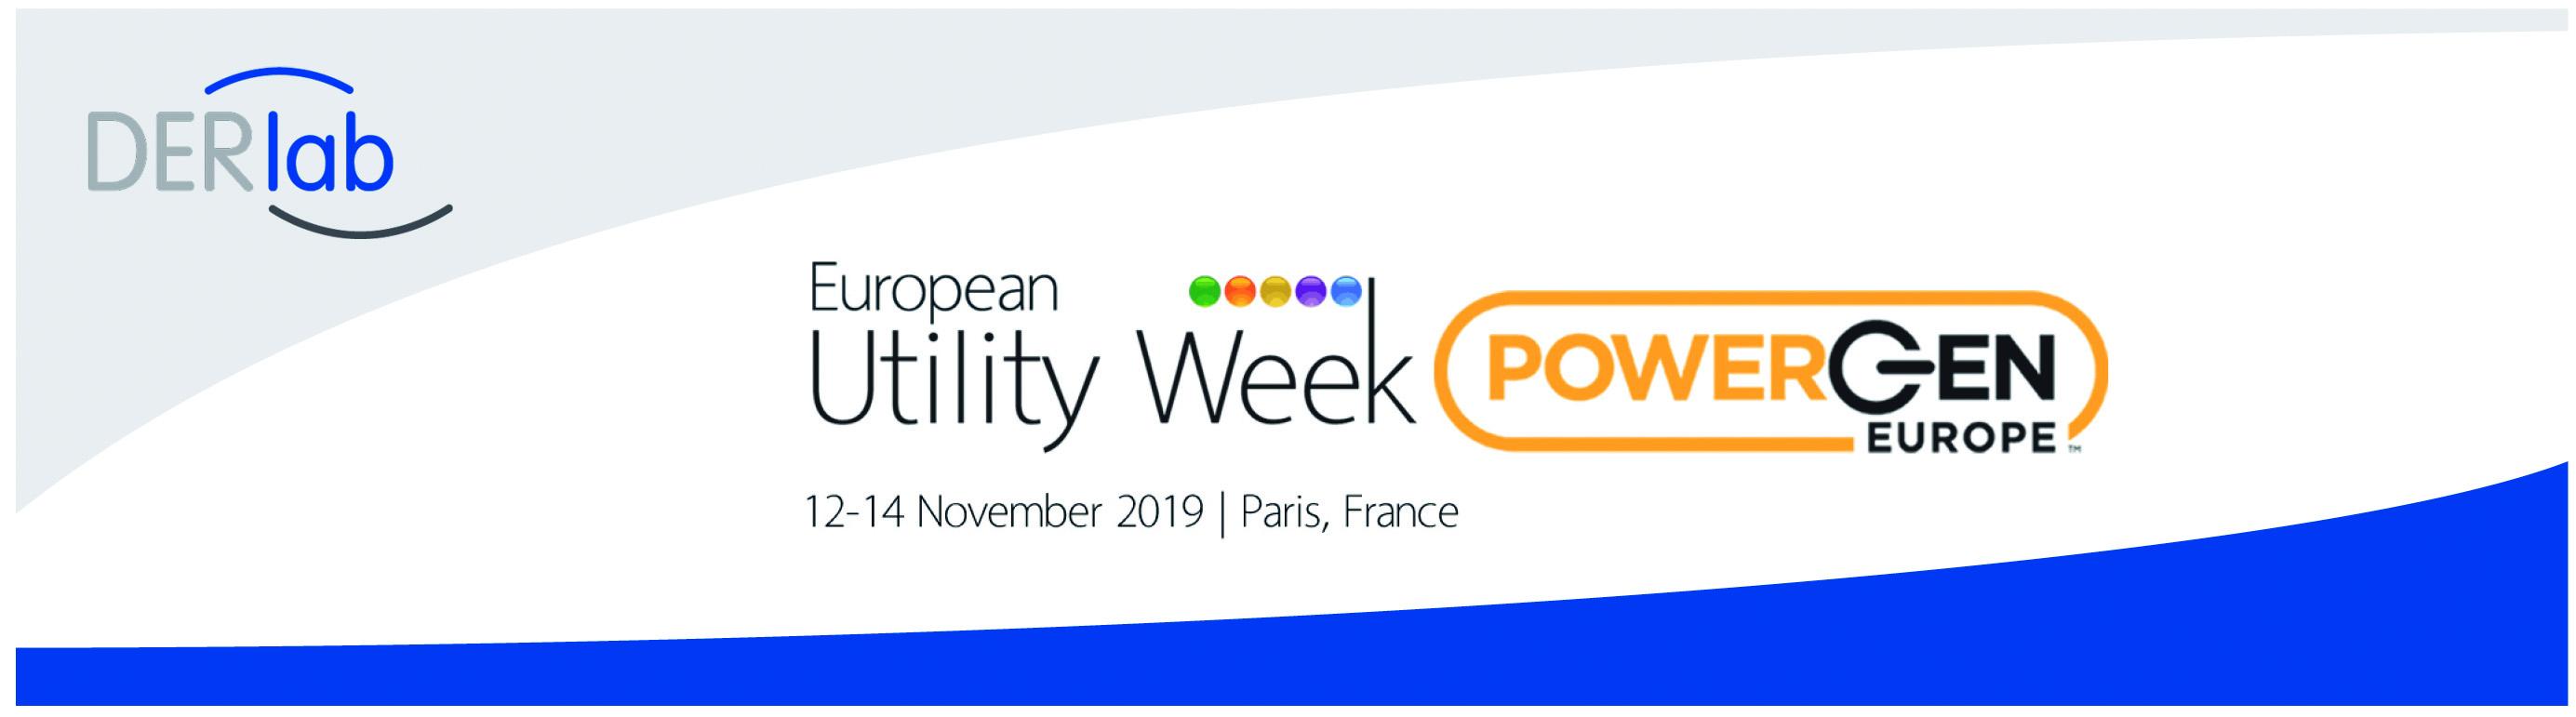 DERlab partners with European Utility Week 2019